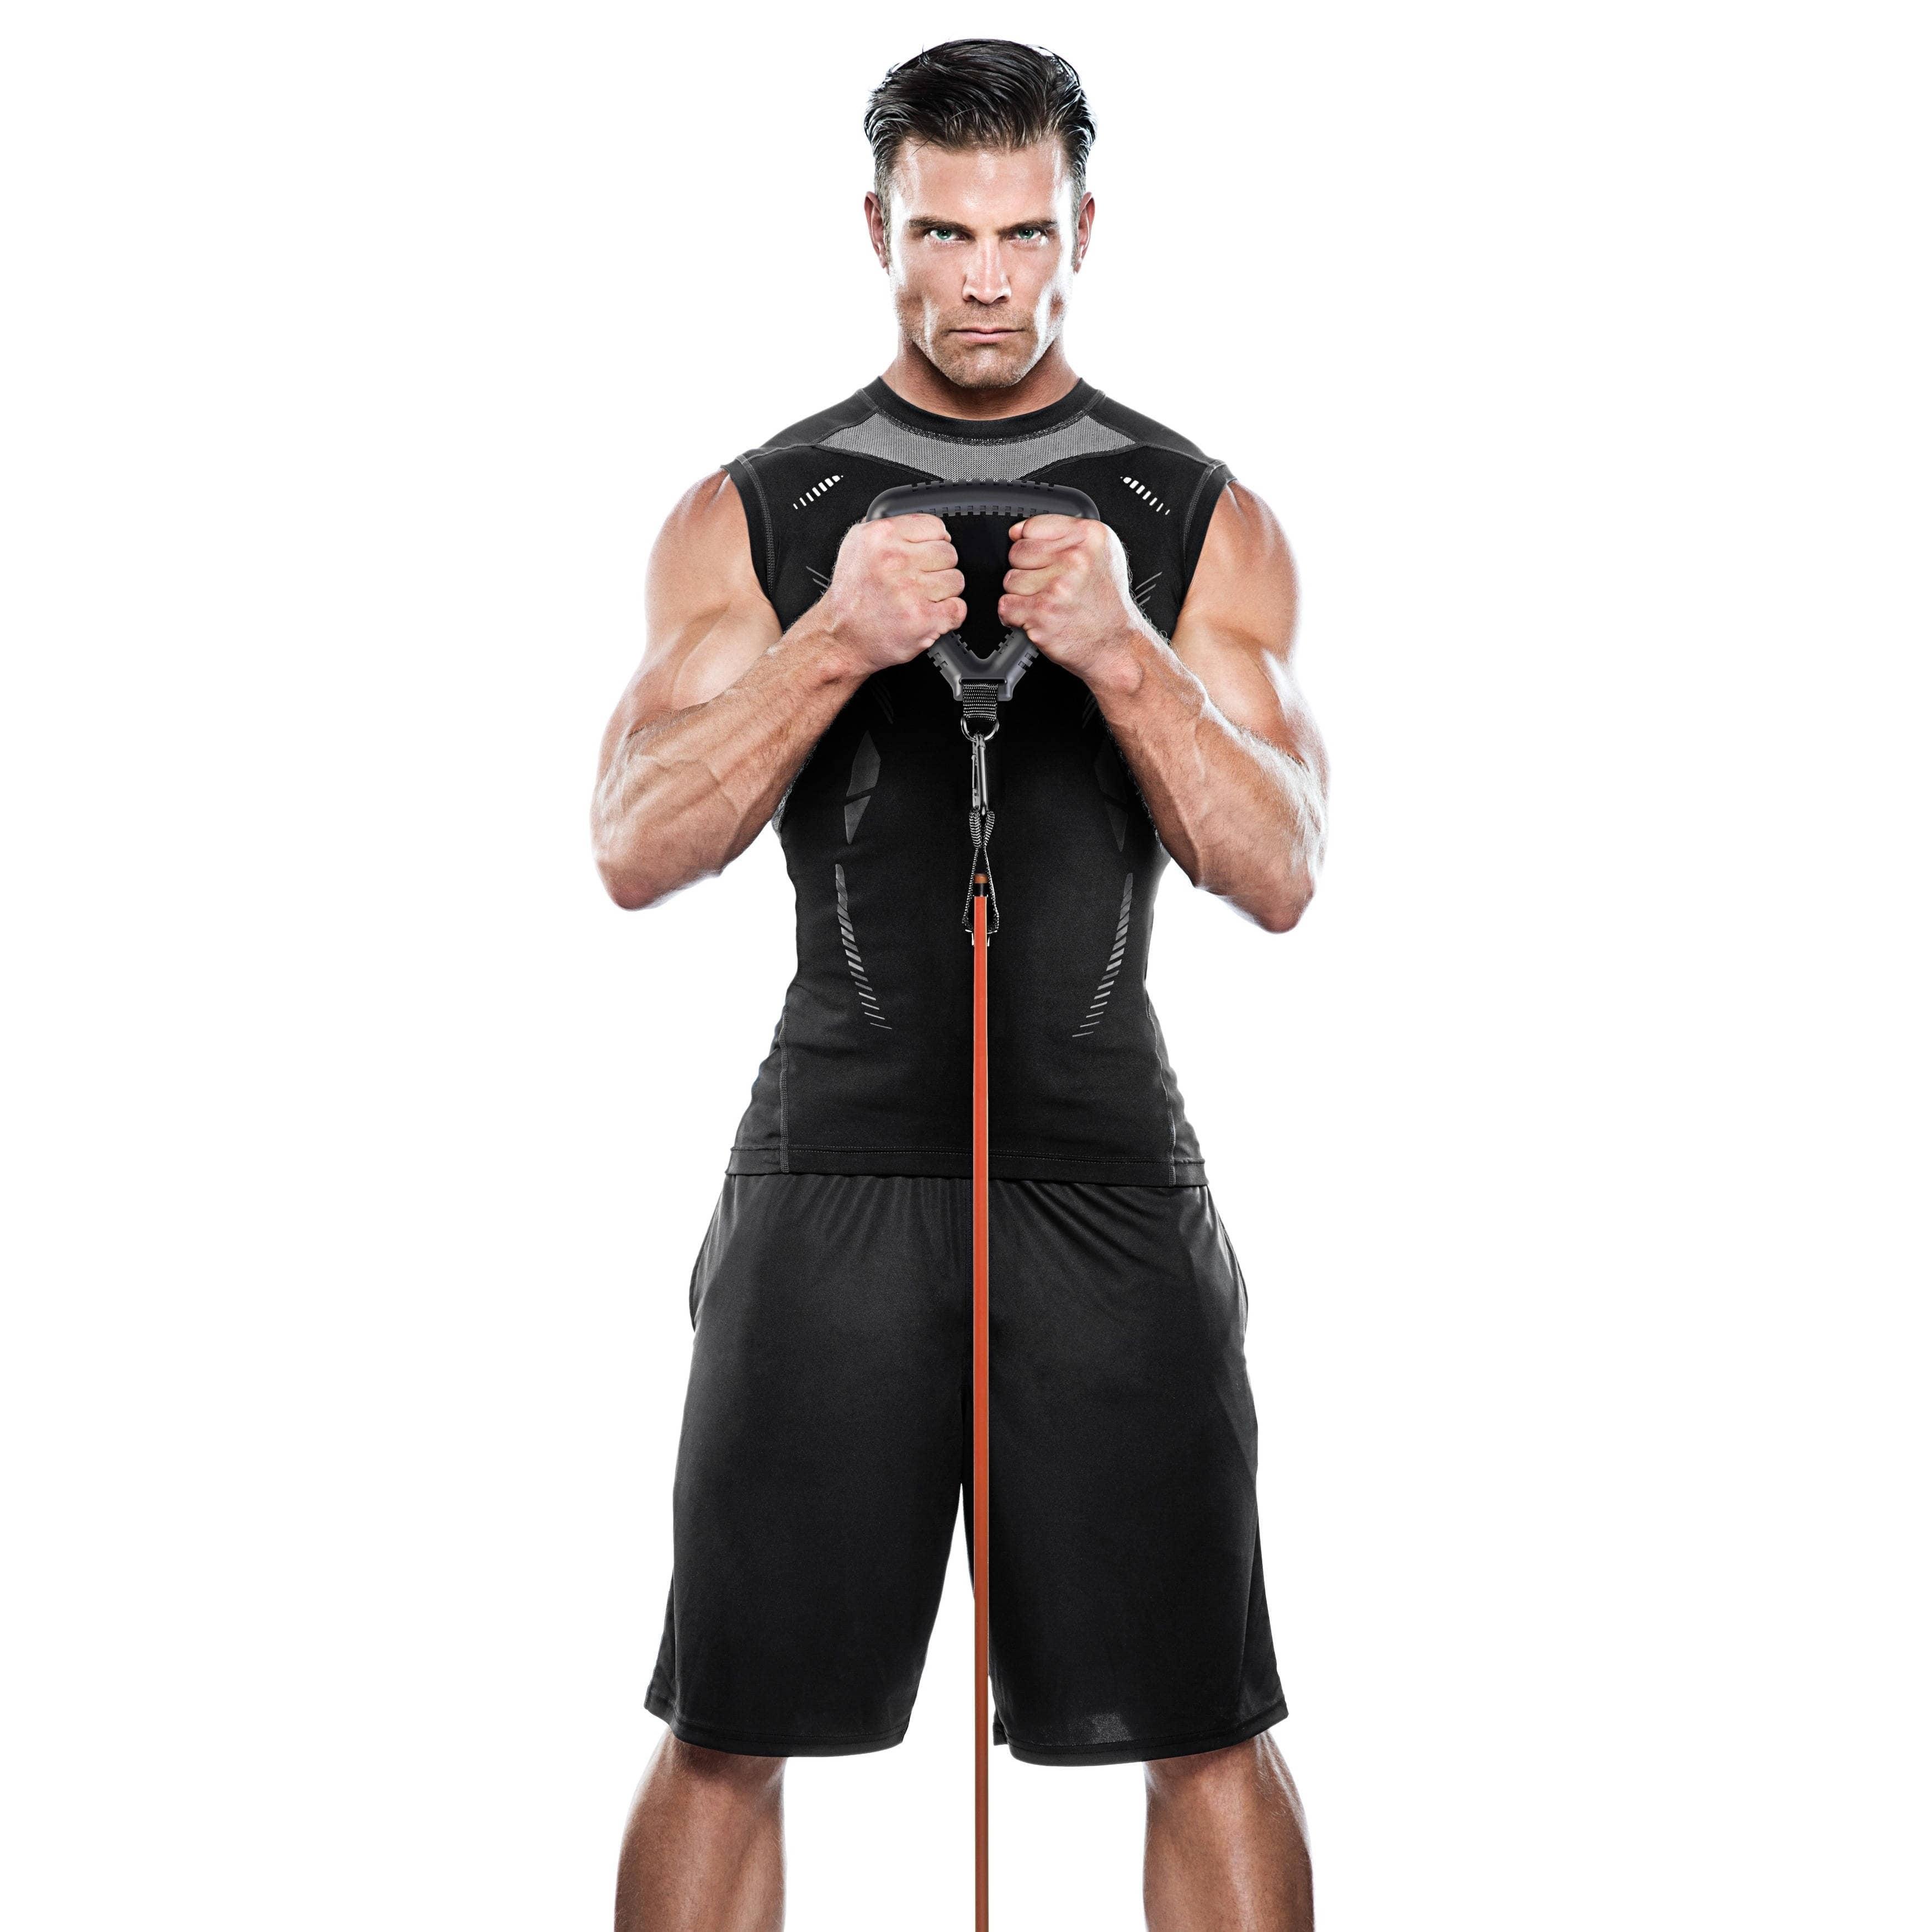 BBKT-090 Grip Handles Resistance Tubes /& More Ankle Strap Bionic Body Kit